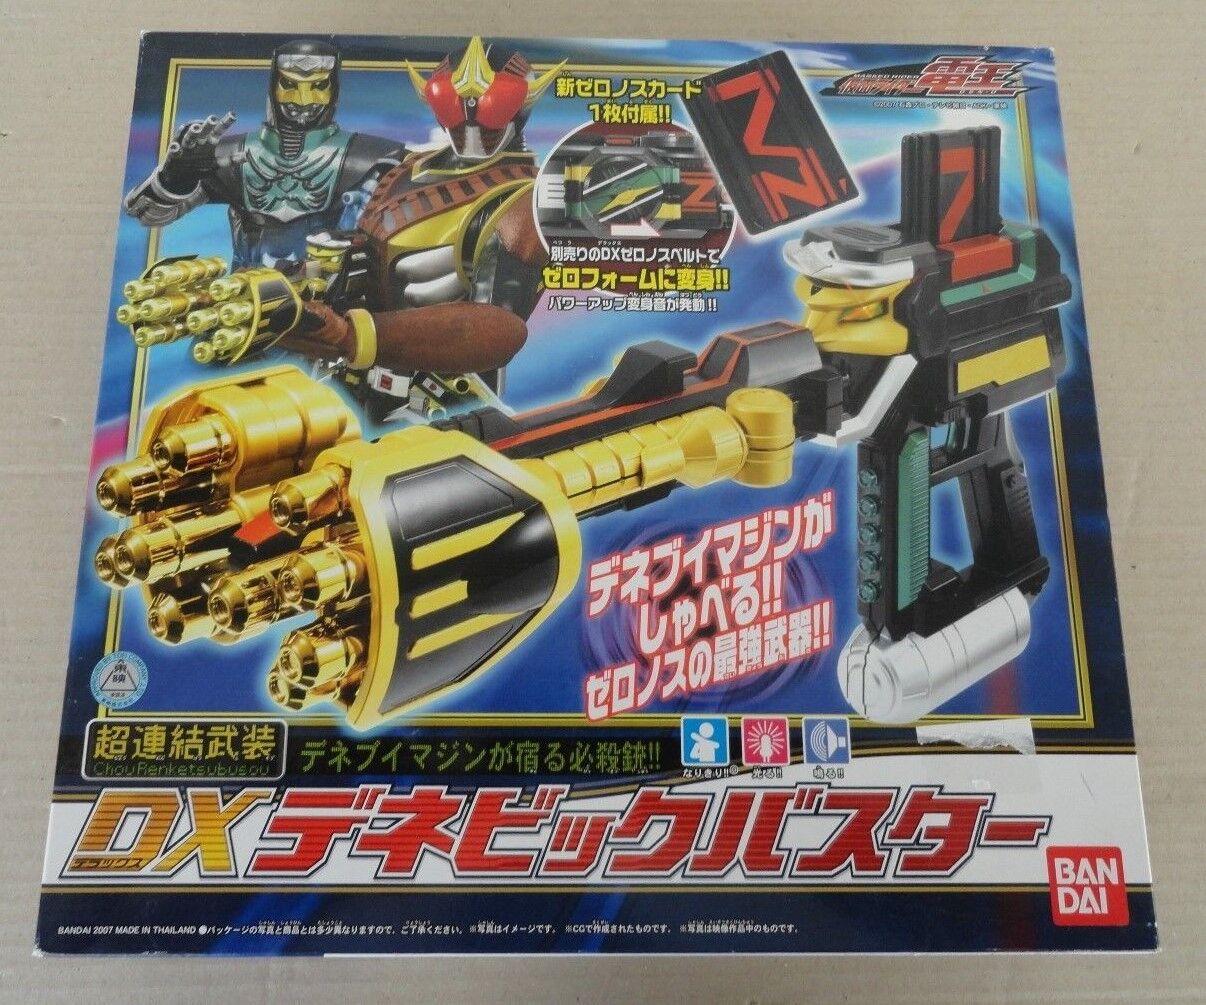 Dene DX Masked Rider Den-O Super Big Buster armed consolidated Bandai brand new